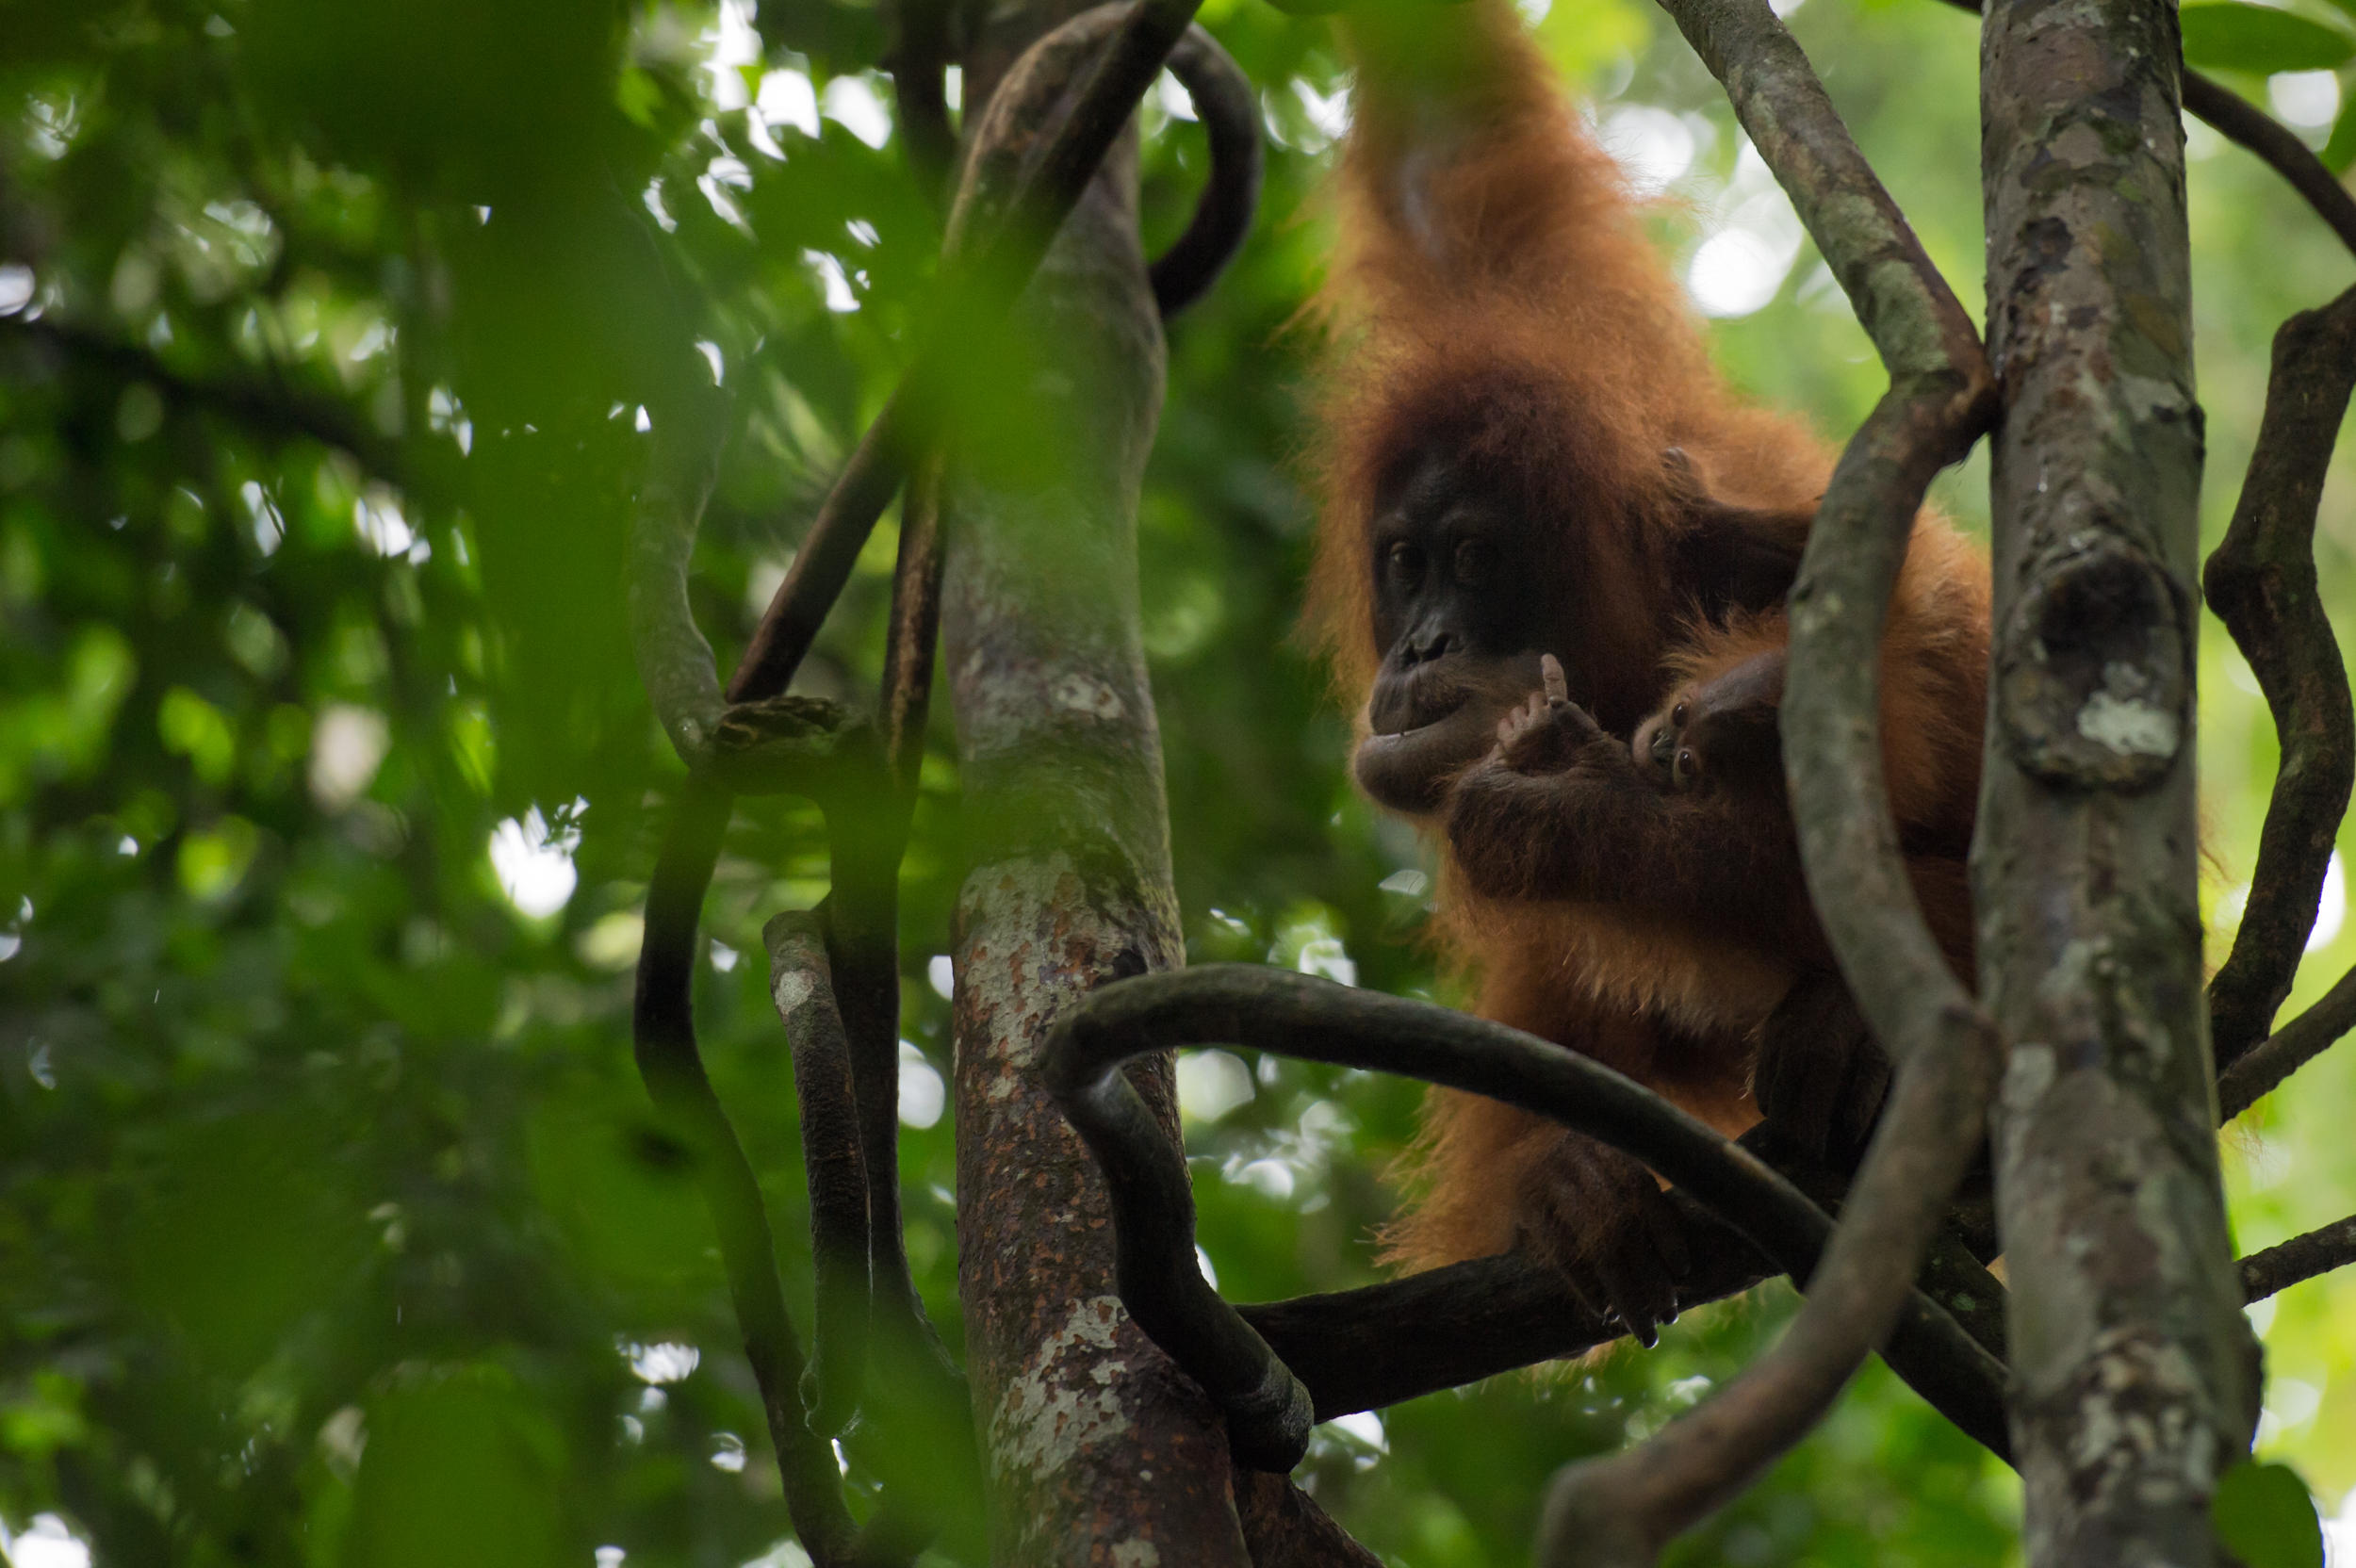 Orangutan Trekking in the Jungles of Sumatra - Photo by Timo Stahl (Instagram: @stahlson_vom_dach)